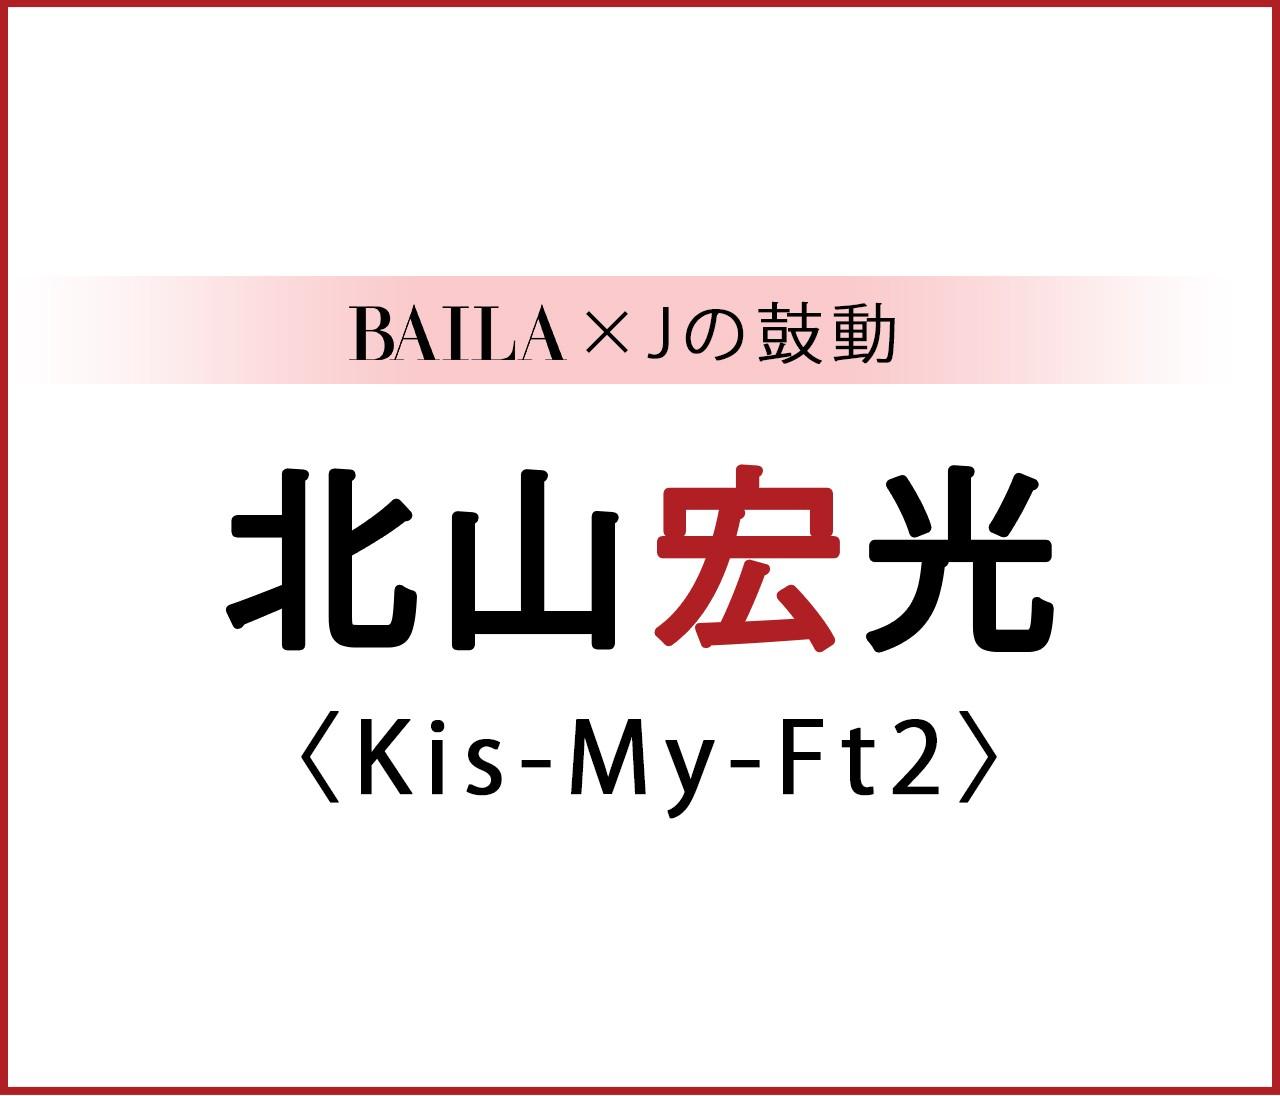 【 #KisMyFt2 #北山宏光 】Kis-My-Ft2 北山宏光スペシャルインタビュー!【BAILA × Jの鼓動】